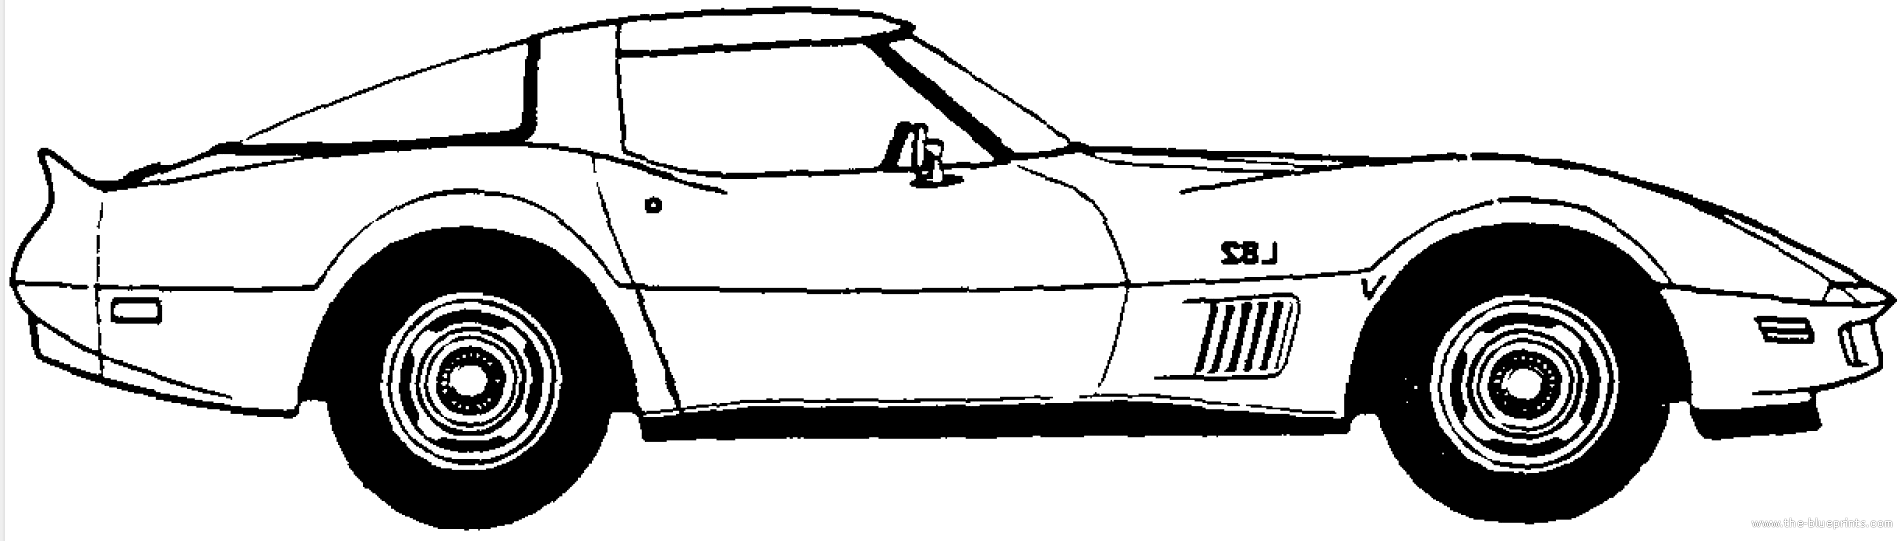 Corvette clipart 3